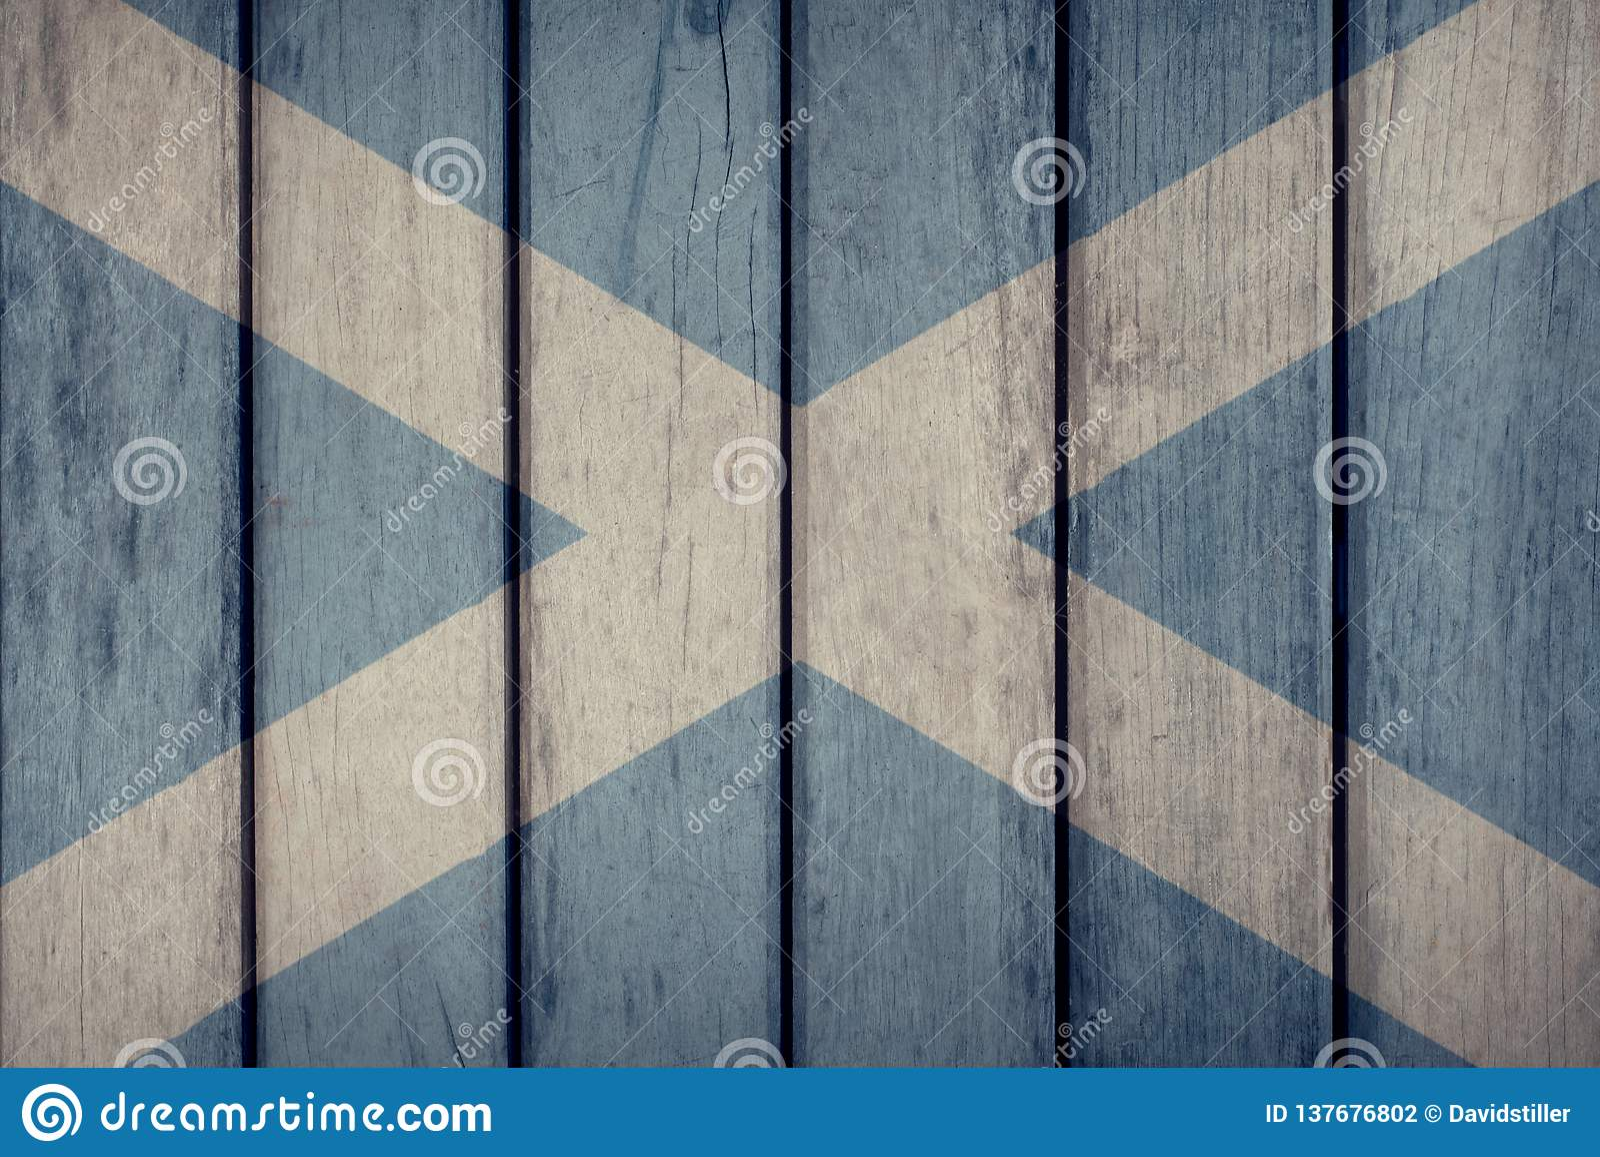 Scotland Flag Wooden Fence